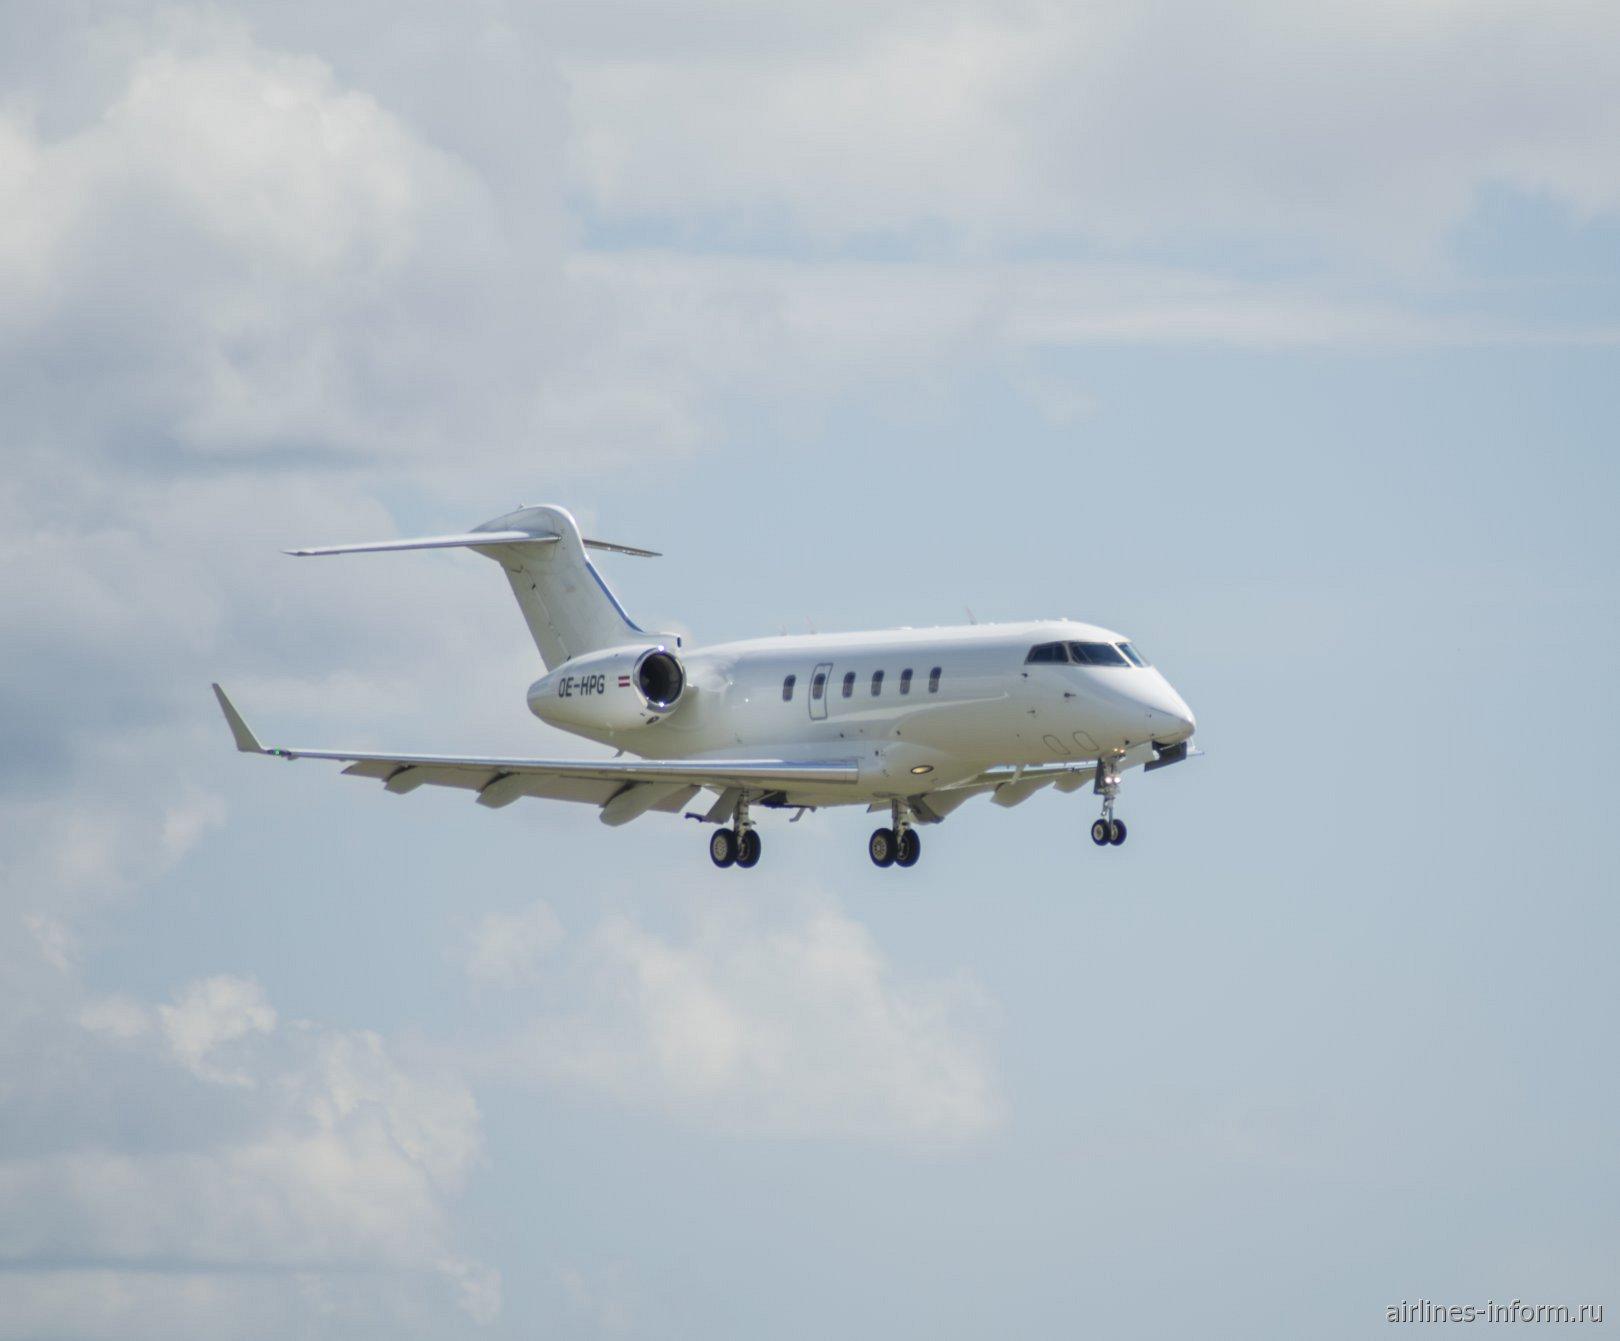 Бизнес-джет Bombardier Challenger 300 рег. номер OE-HPG перед посадкой в аэропорту Внуково